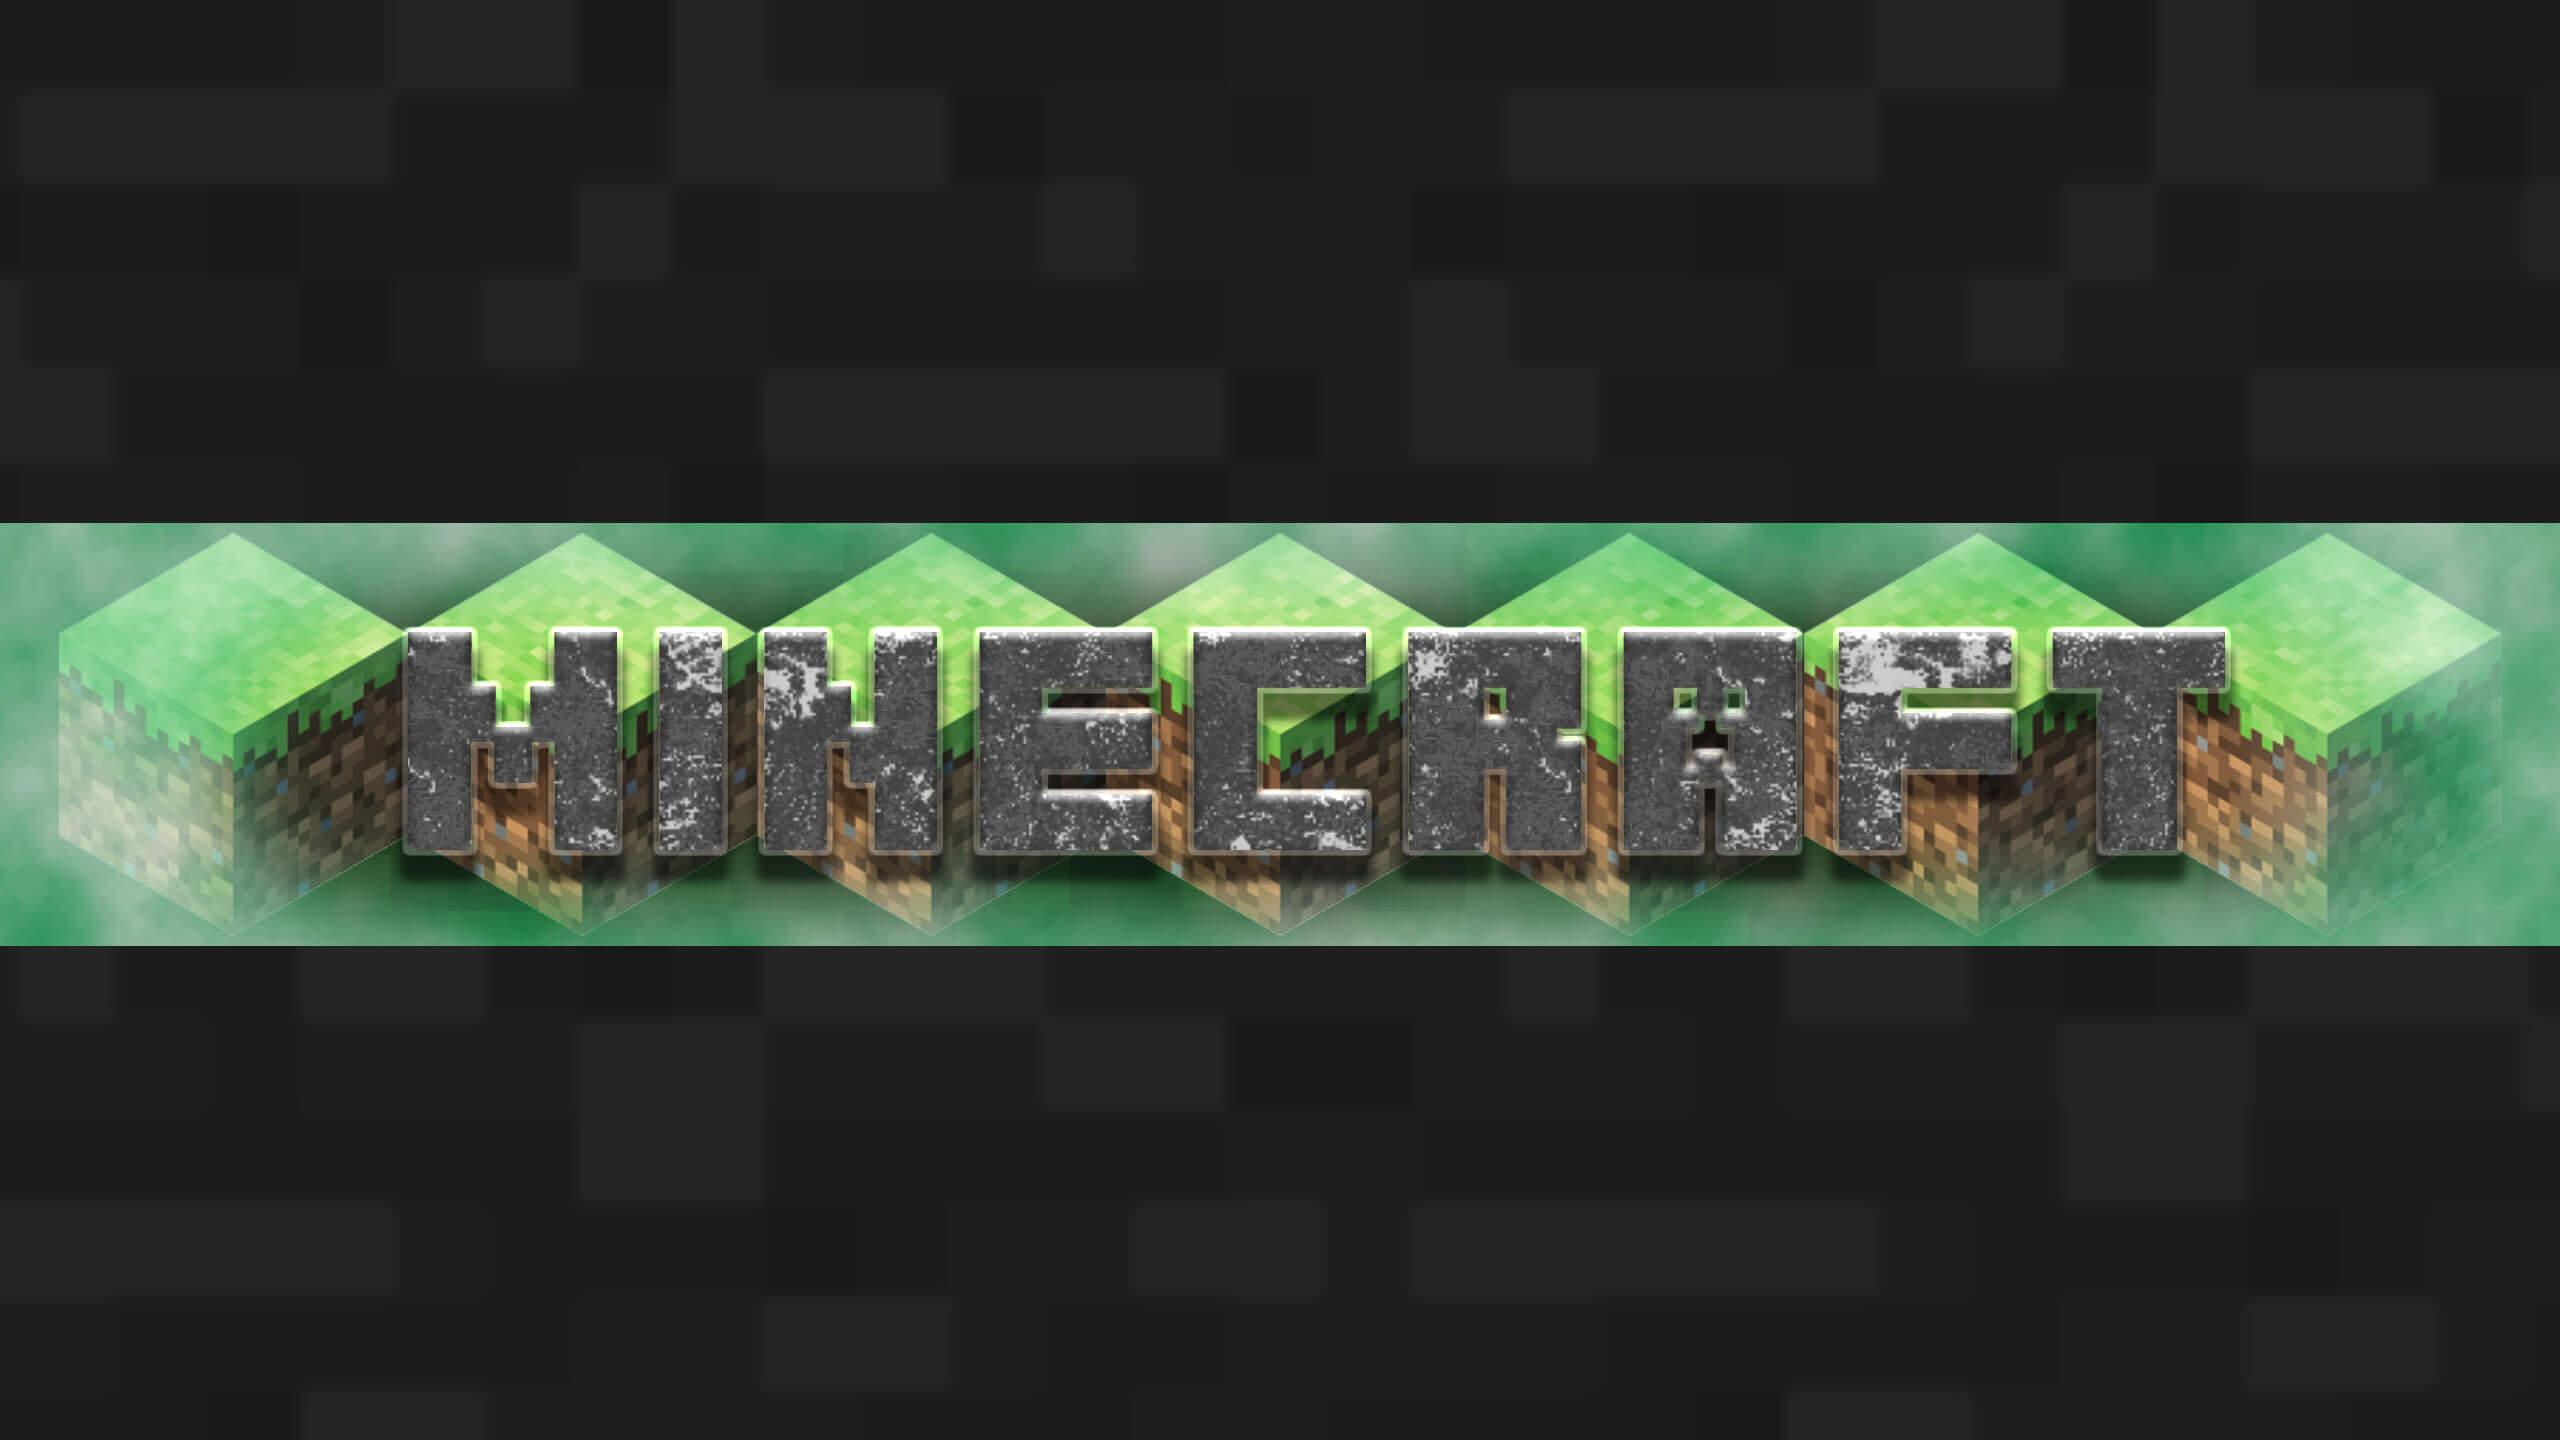 Зелёная картинка для шапки ютуба на надписью майнкрафт.